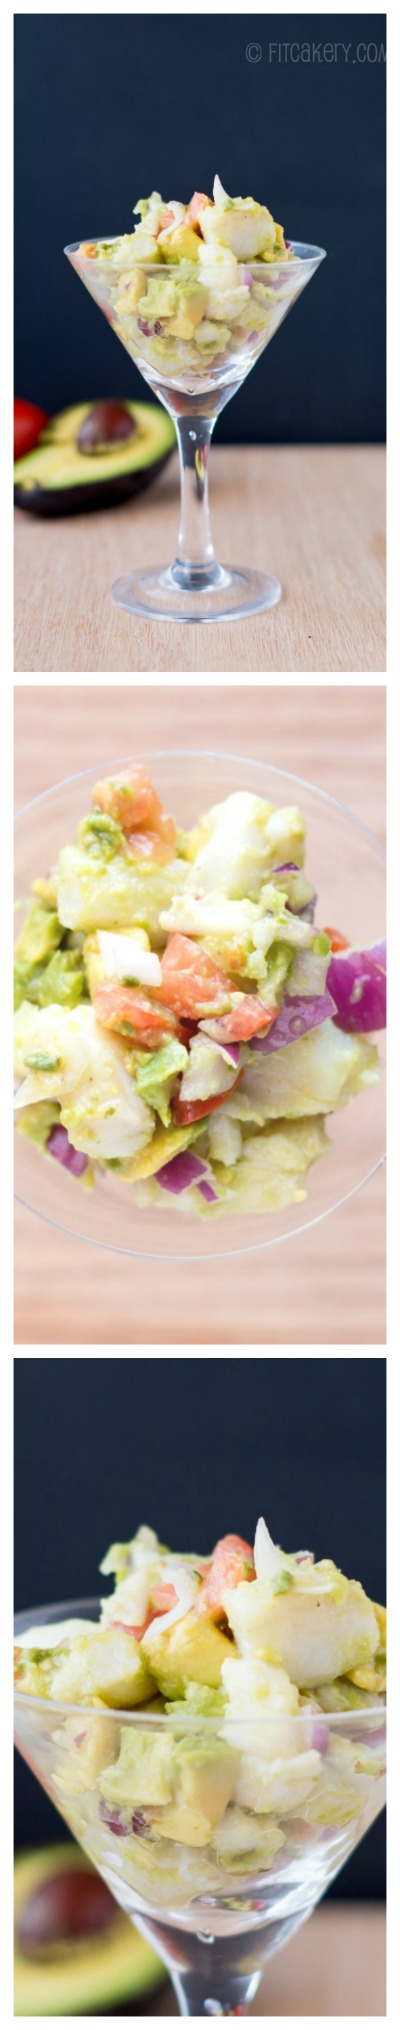 Simple Ceviche recipe - fresh, easy, and delicious! | FitCakery.com